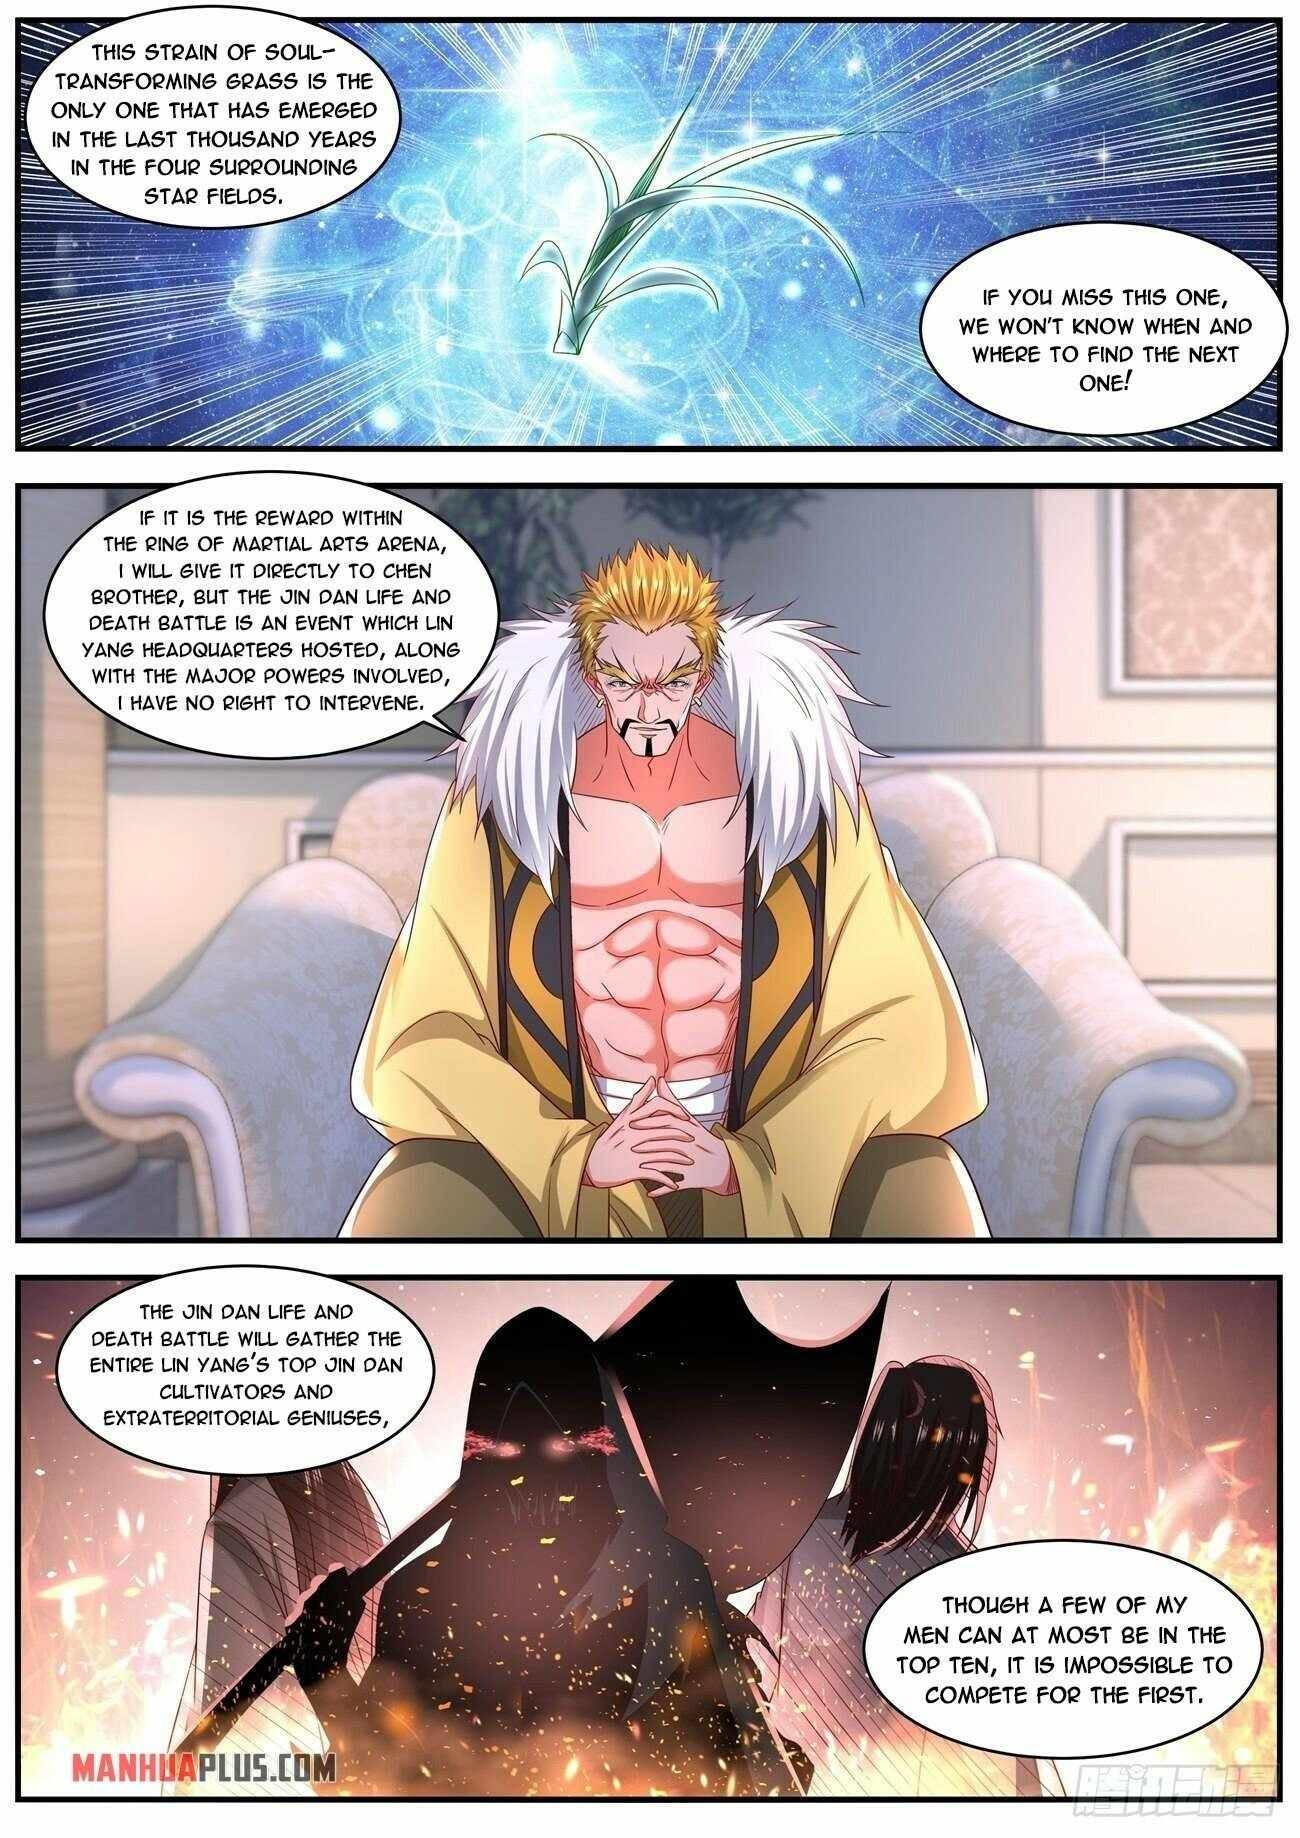 Rebirth Of The Urban Immortal Cultivator Chapter 639 page 8 - Mangakakalot